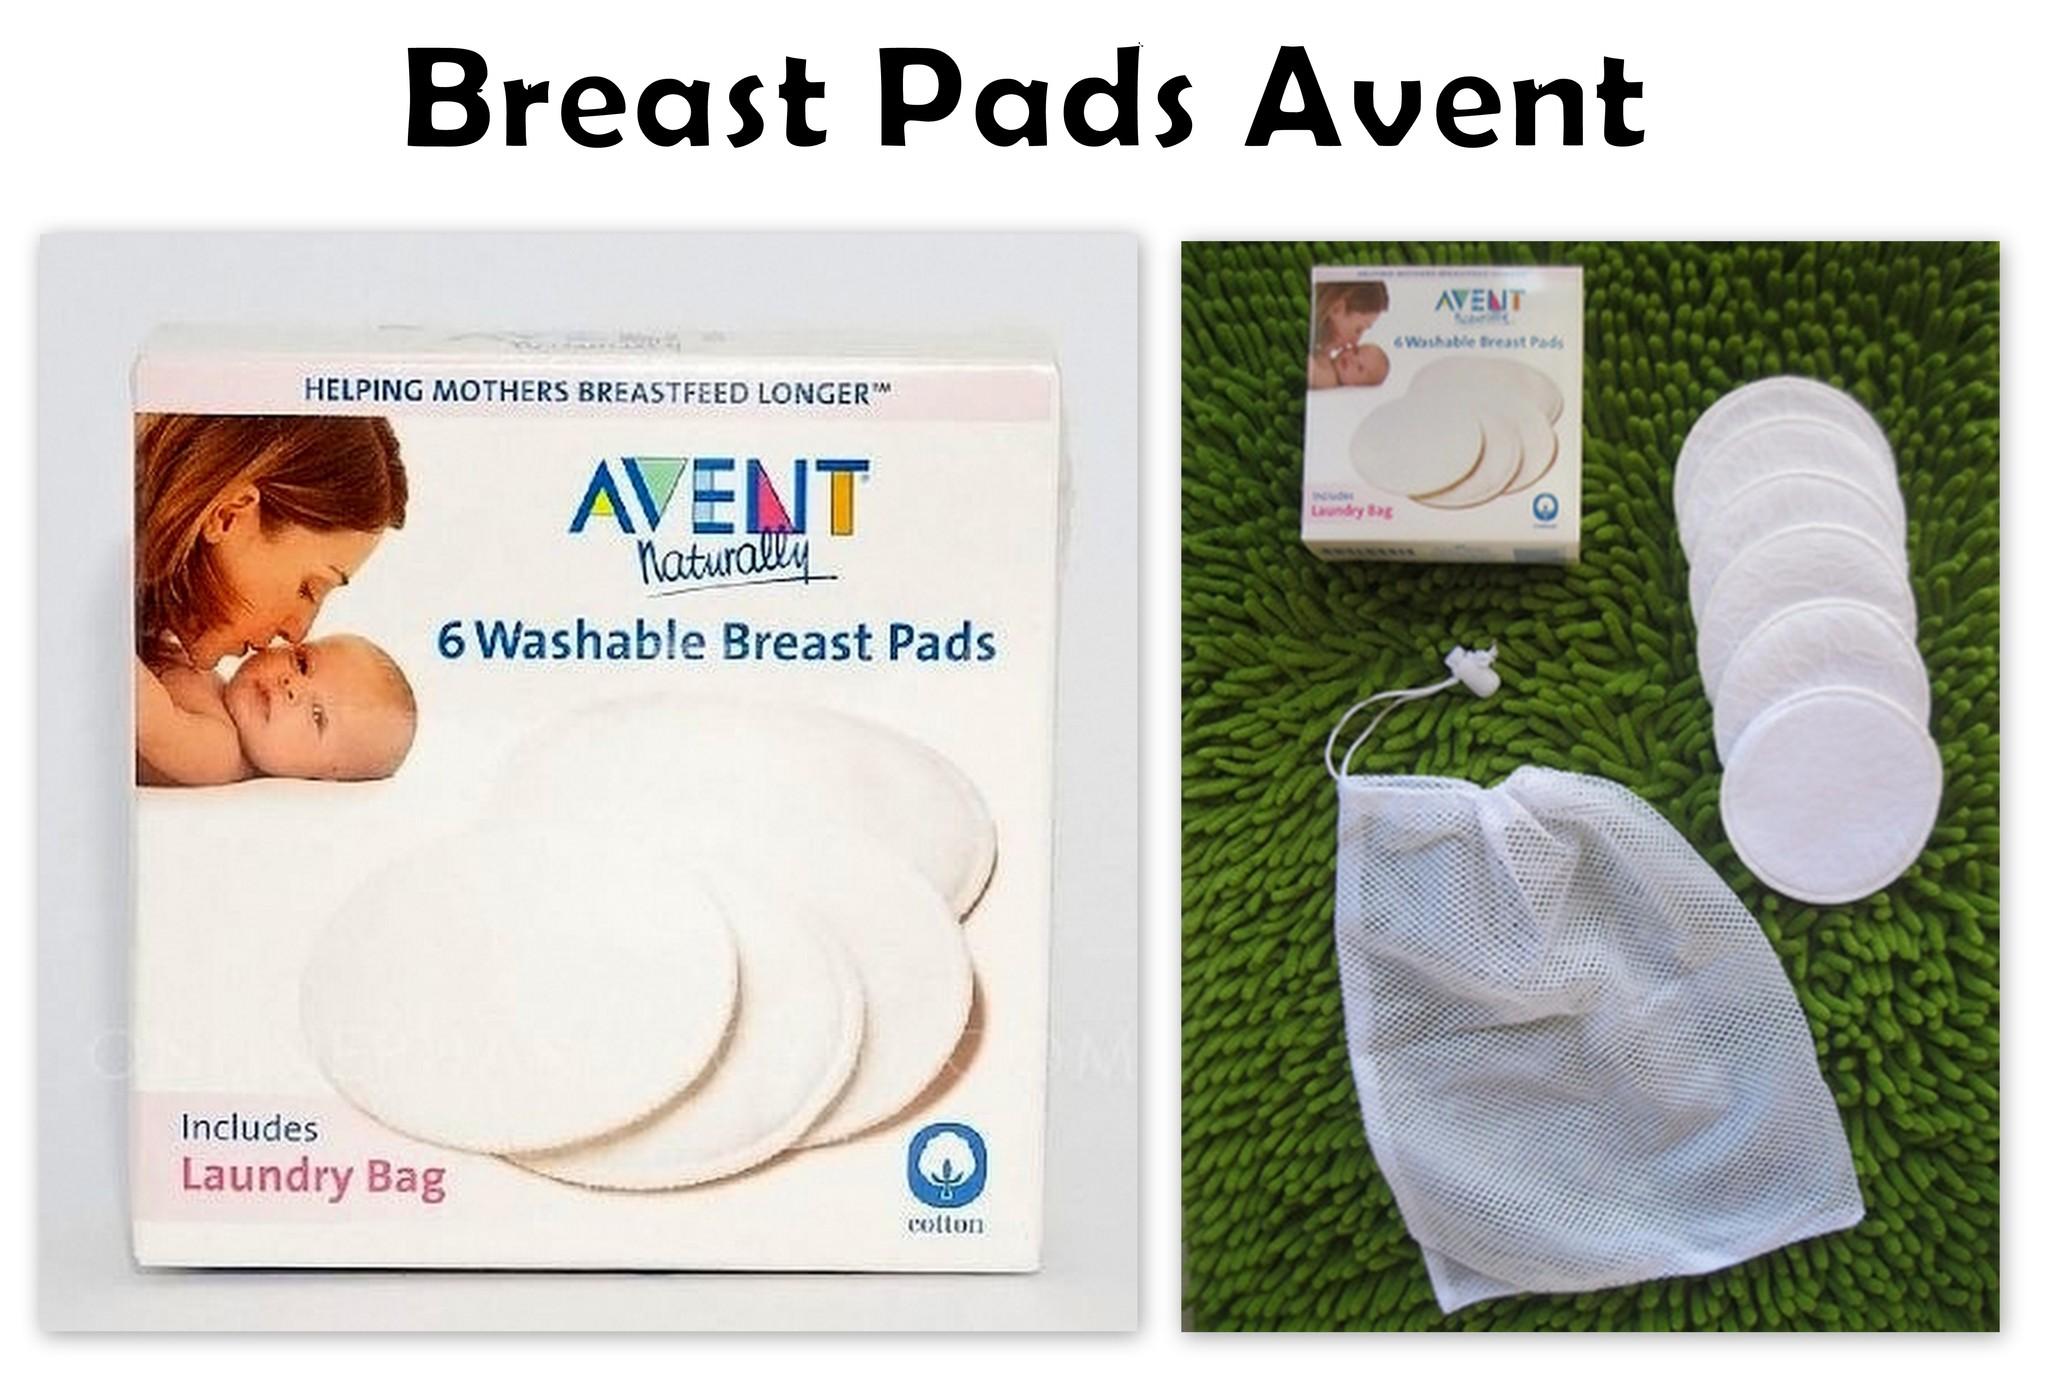 Jual Avent Washable Breast Pad Bambini Bambino Tokopedia Breastpads